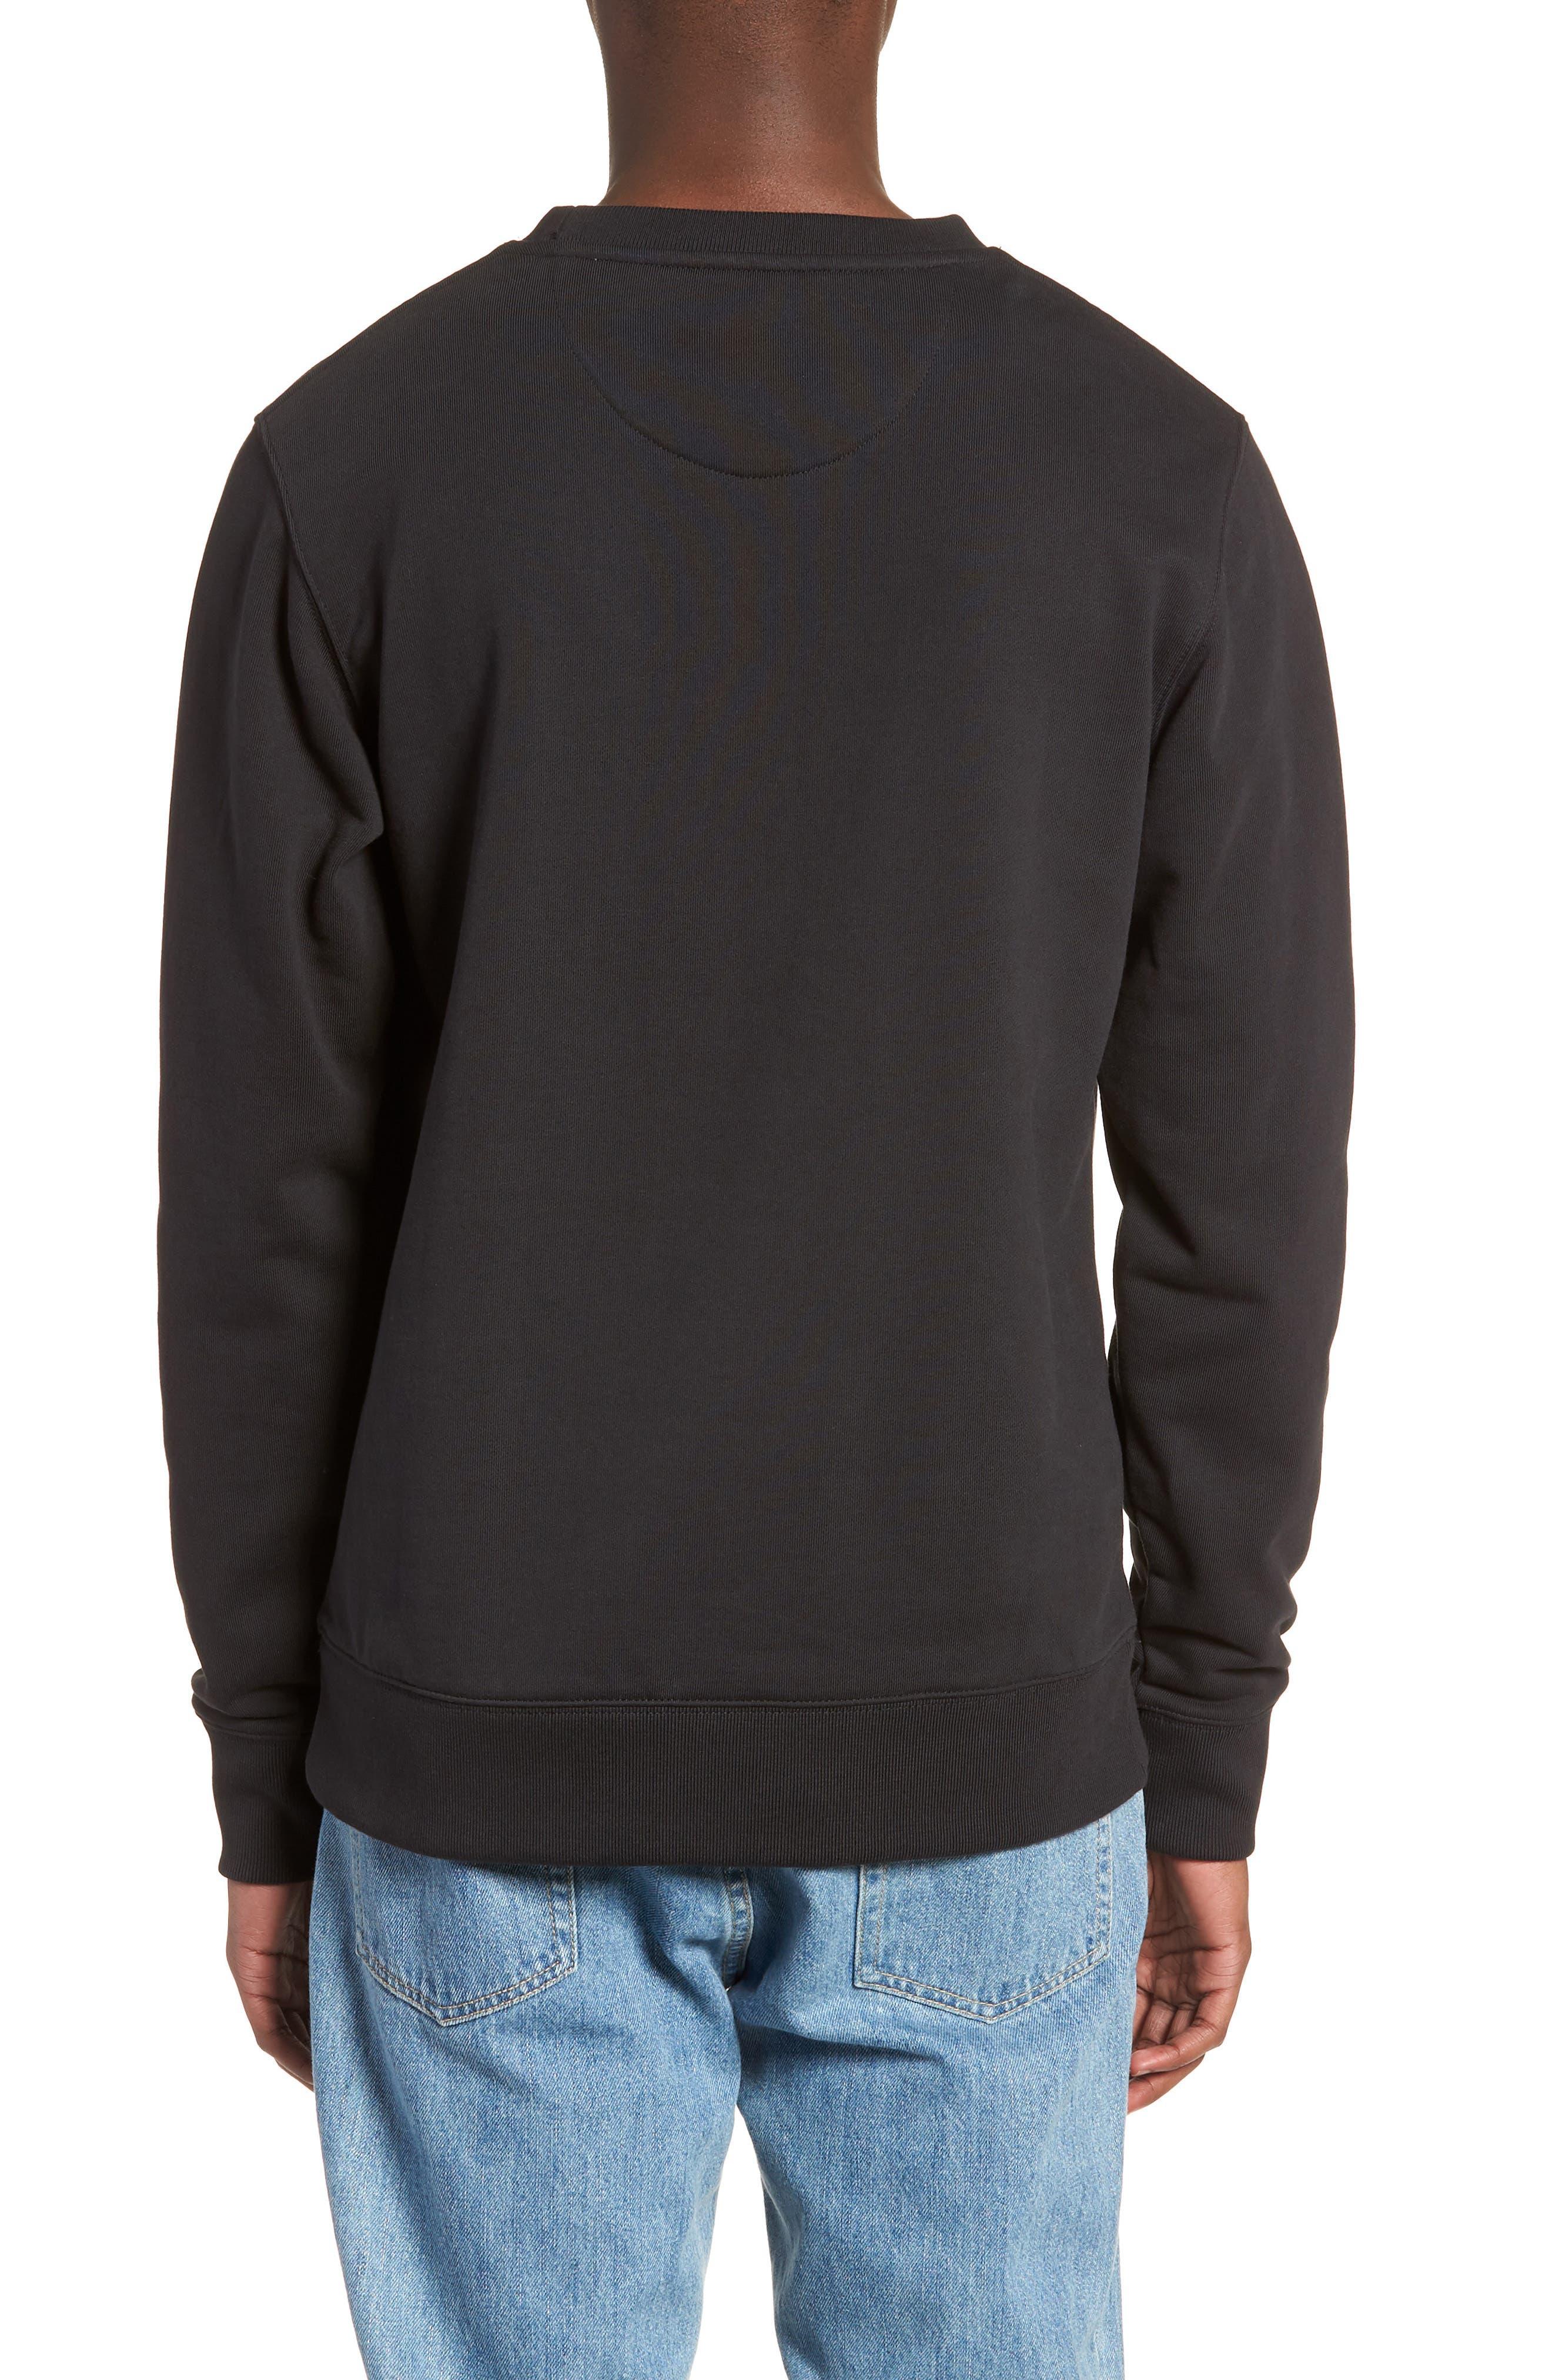 Bowery Slash Sweatshirt,                             Alternate thumbnail 2, color,                             Black